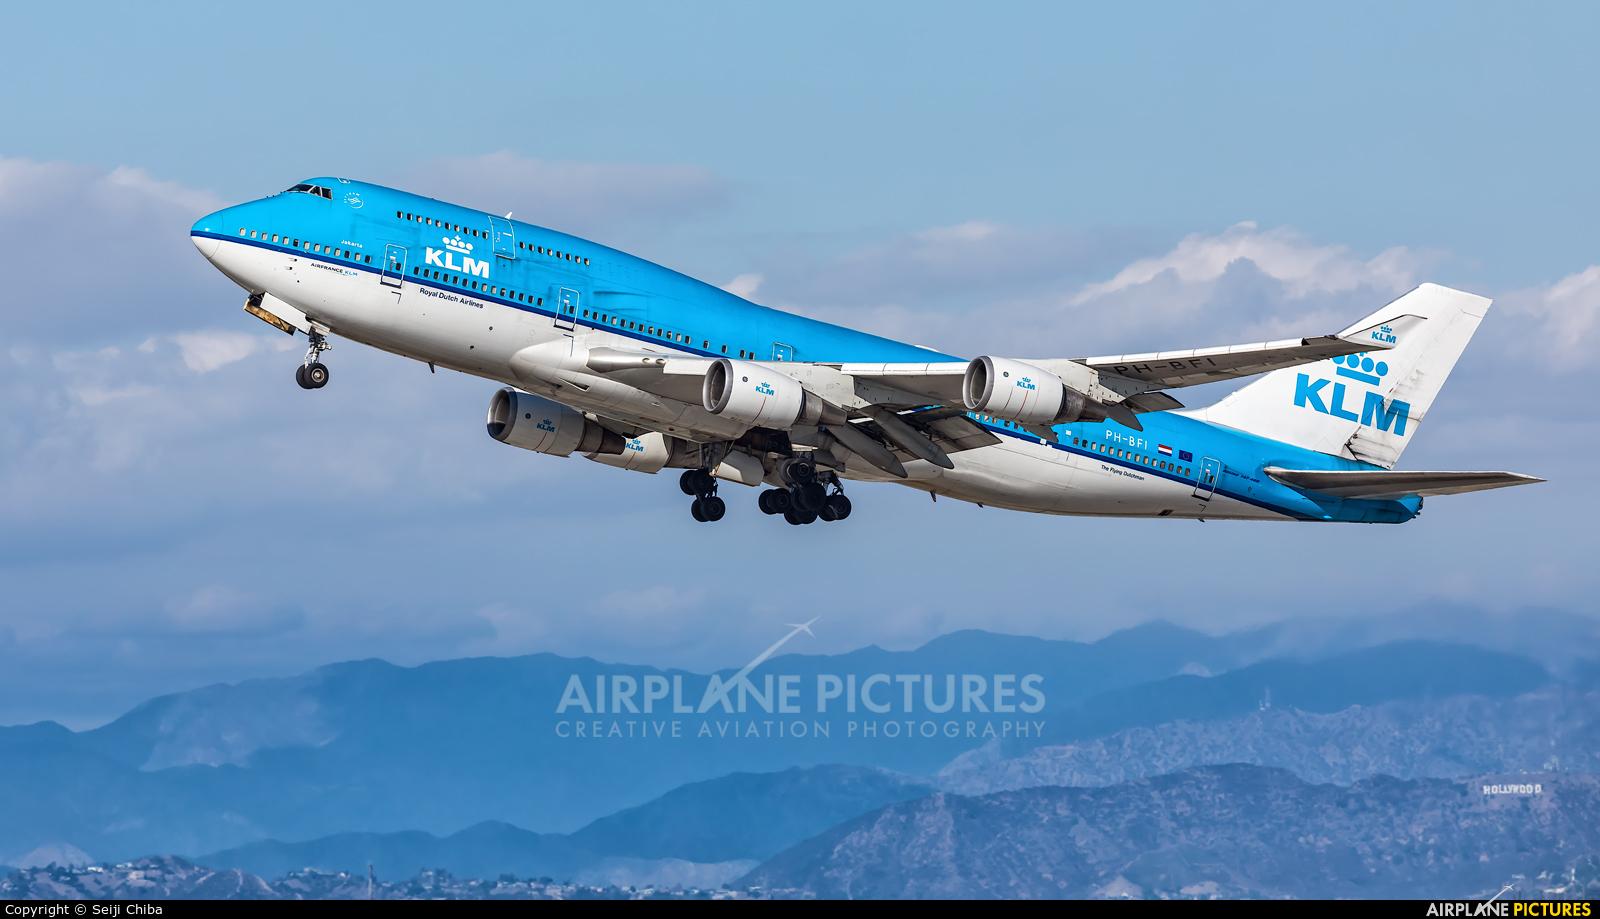 PH-BFI - KLM Boeing 747-400 at Los Angeles Intl | Photo ID